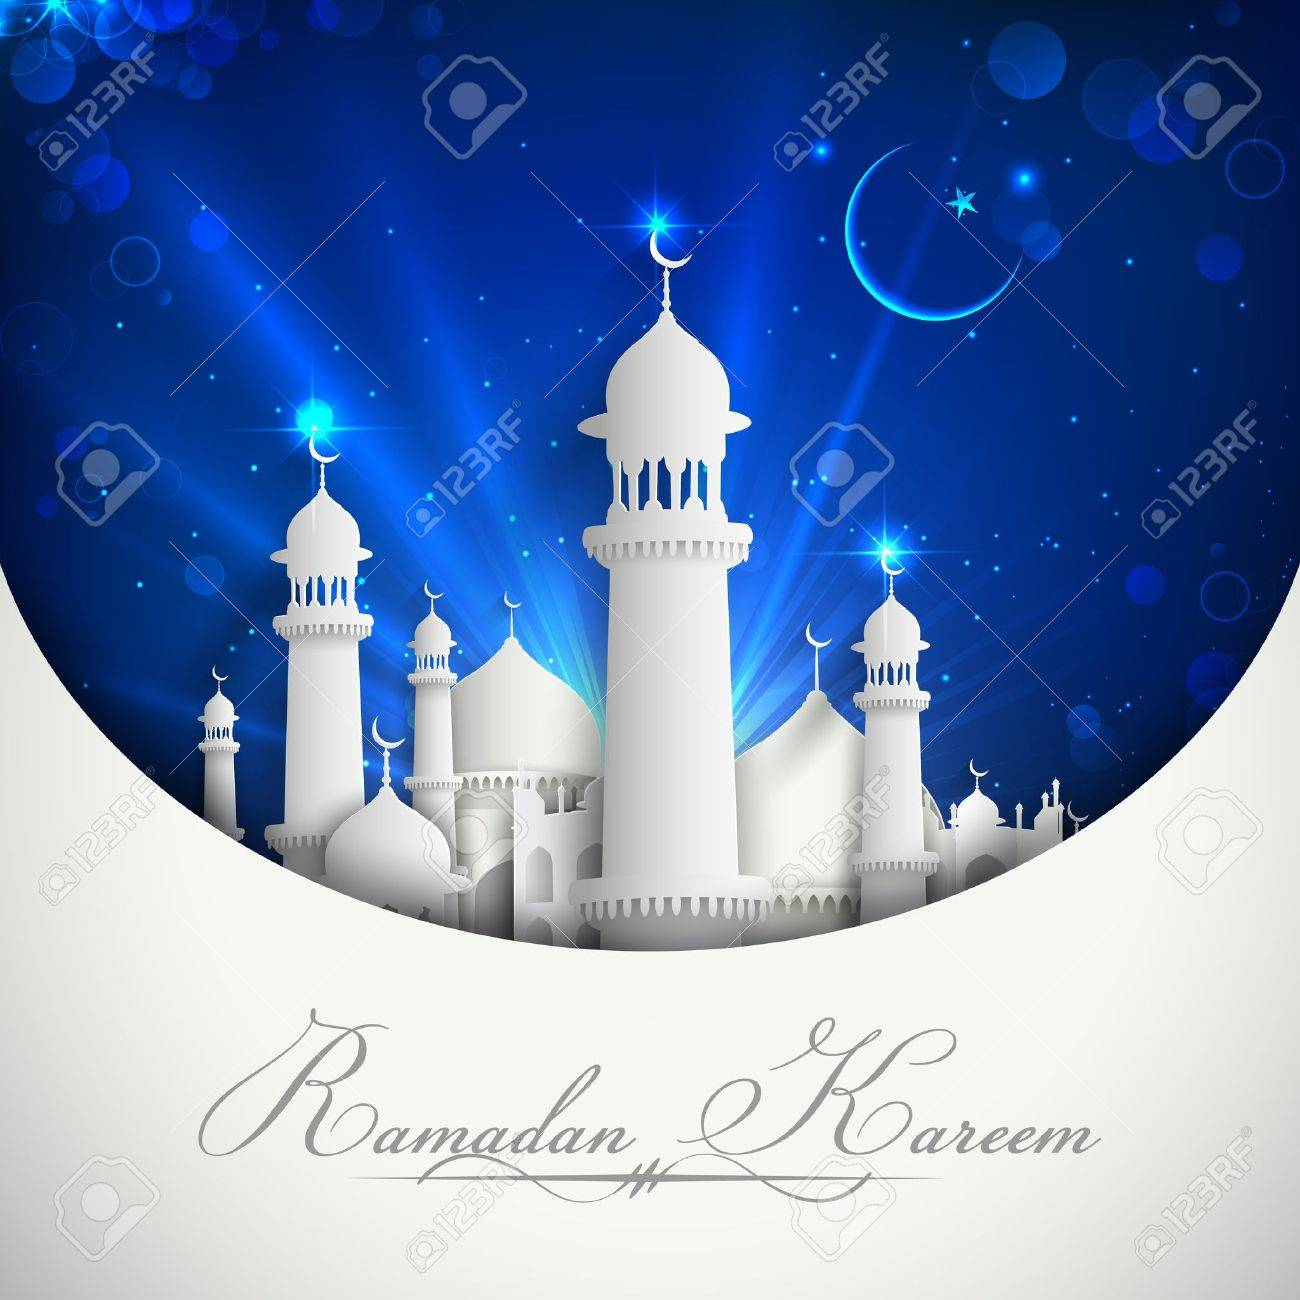 Mosque background for ramadan kareem stock photography image - Illustration Of Eid Mubarak Background With Mosque Stock Illustration 21016864